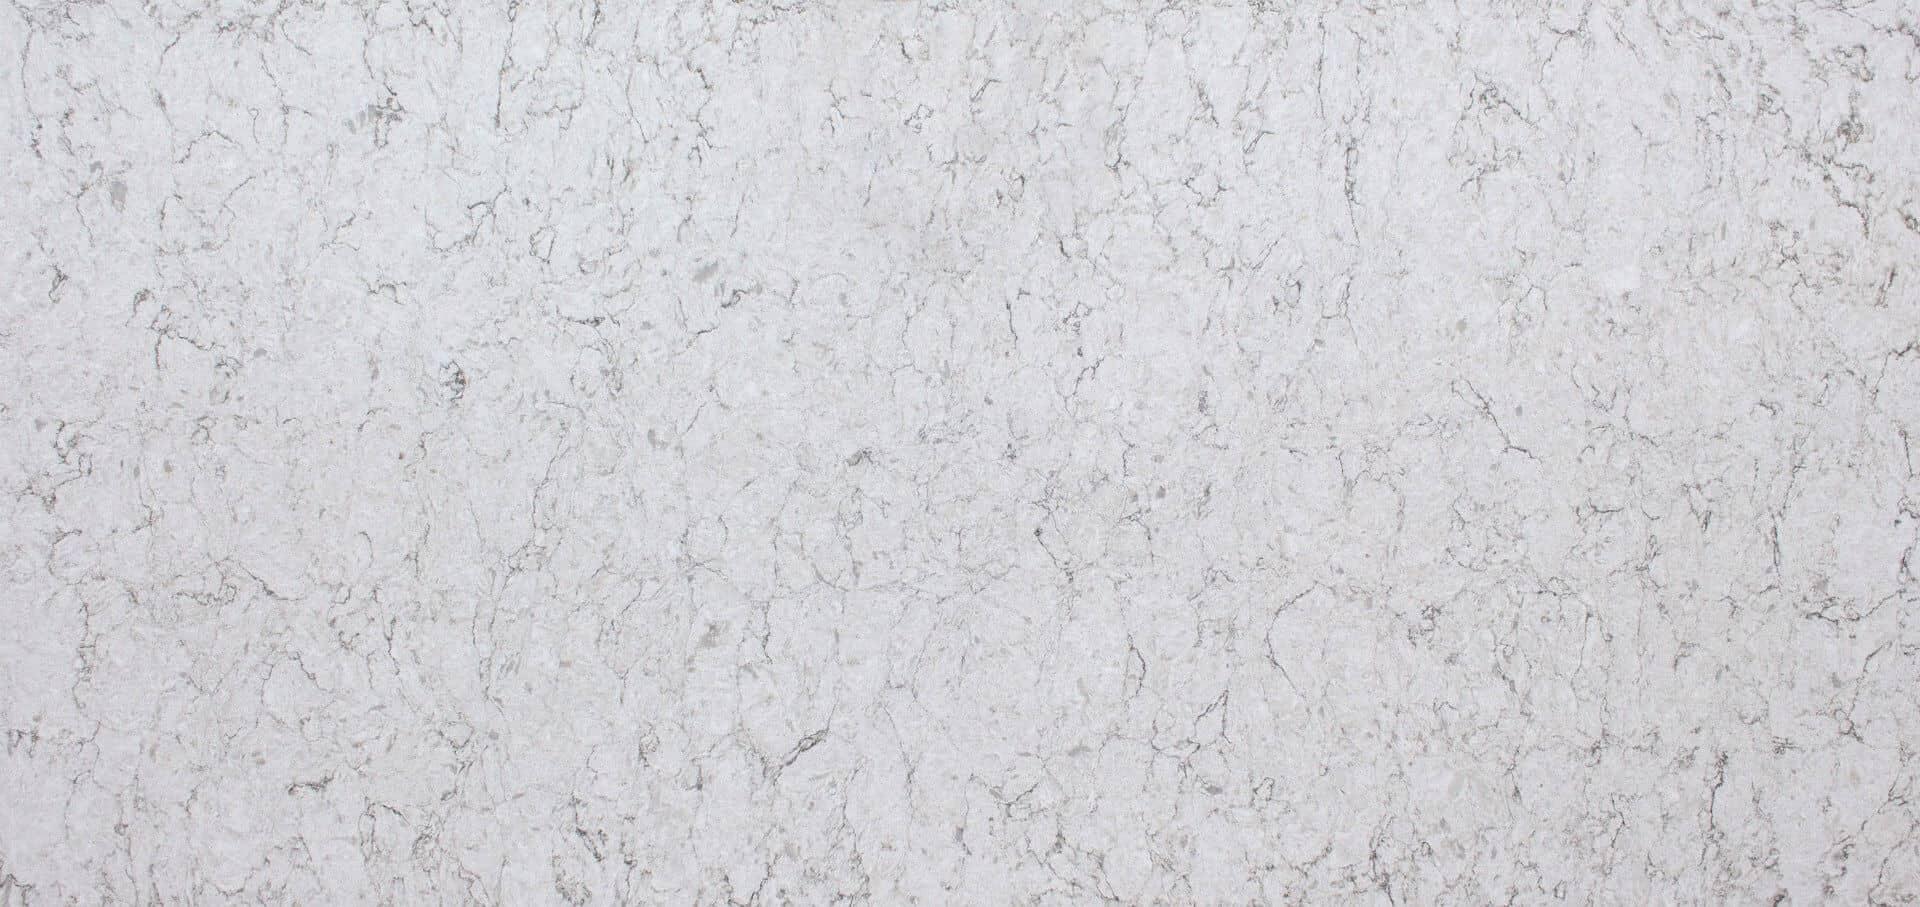 Vicostone Quartz Countertops Stonehenge Marble Amp Granite